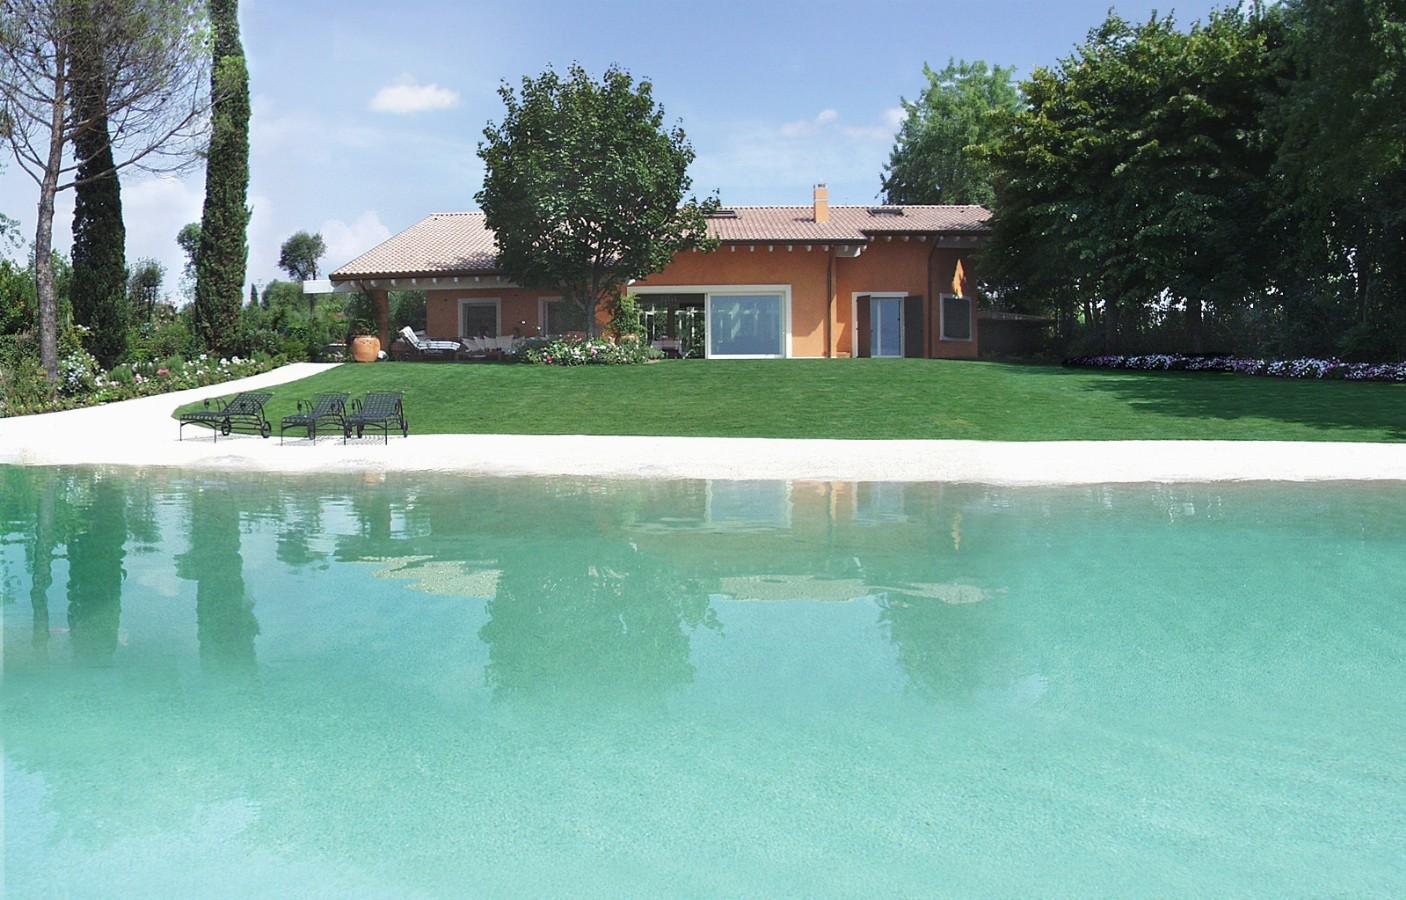 Where it begins the lake ends the swimming pool - استخر های شنا